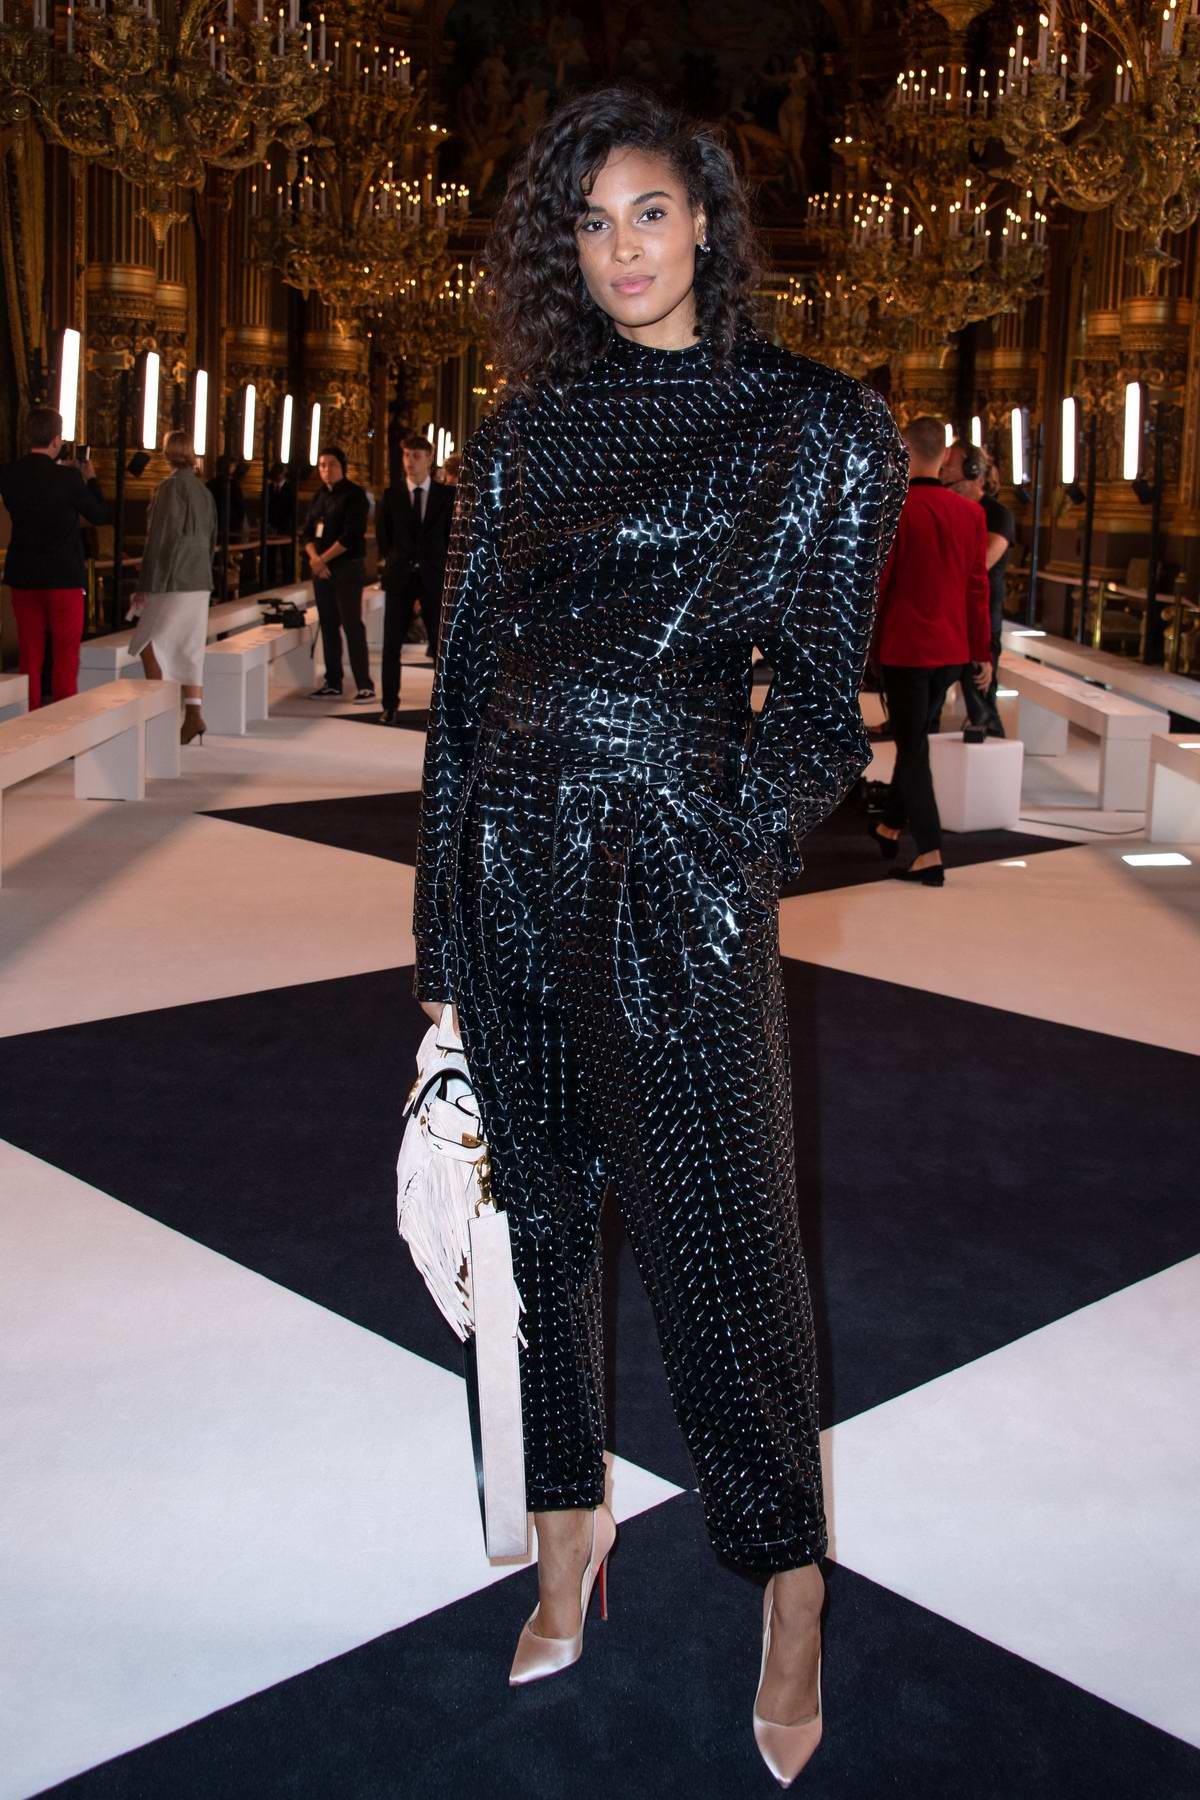 Cindy Bruna attends the Balmain Womenswear Spring/Summer 2020 during Paris Fashion Week in Paris, France